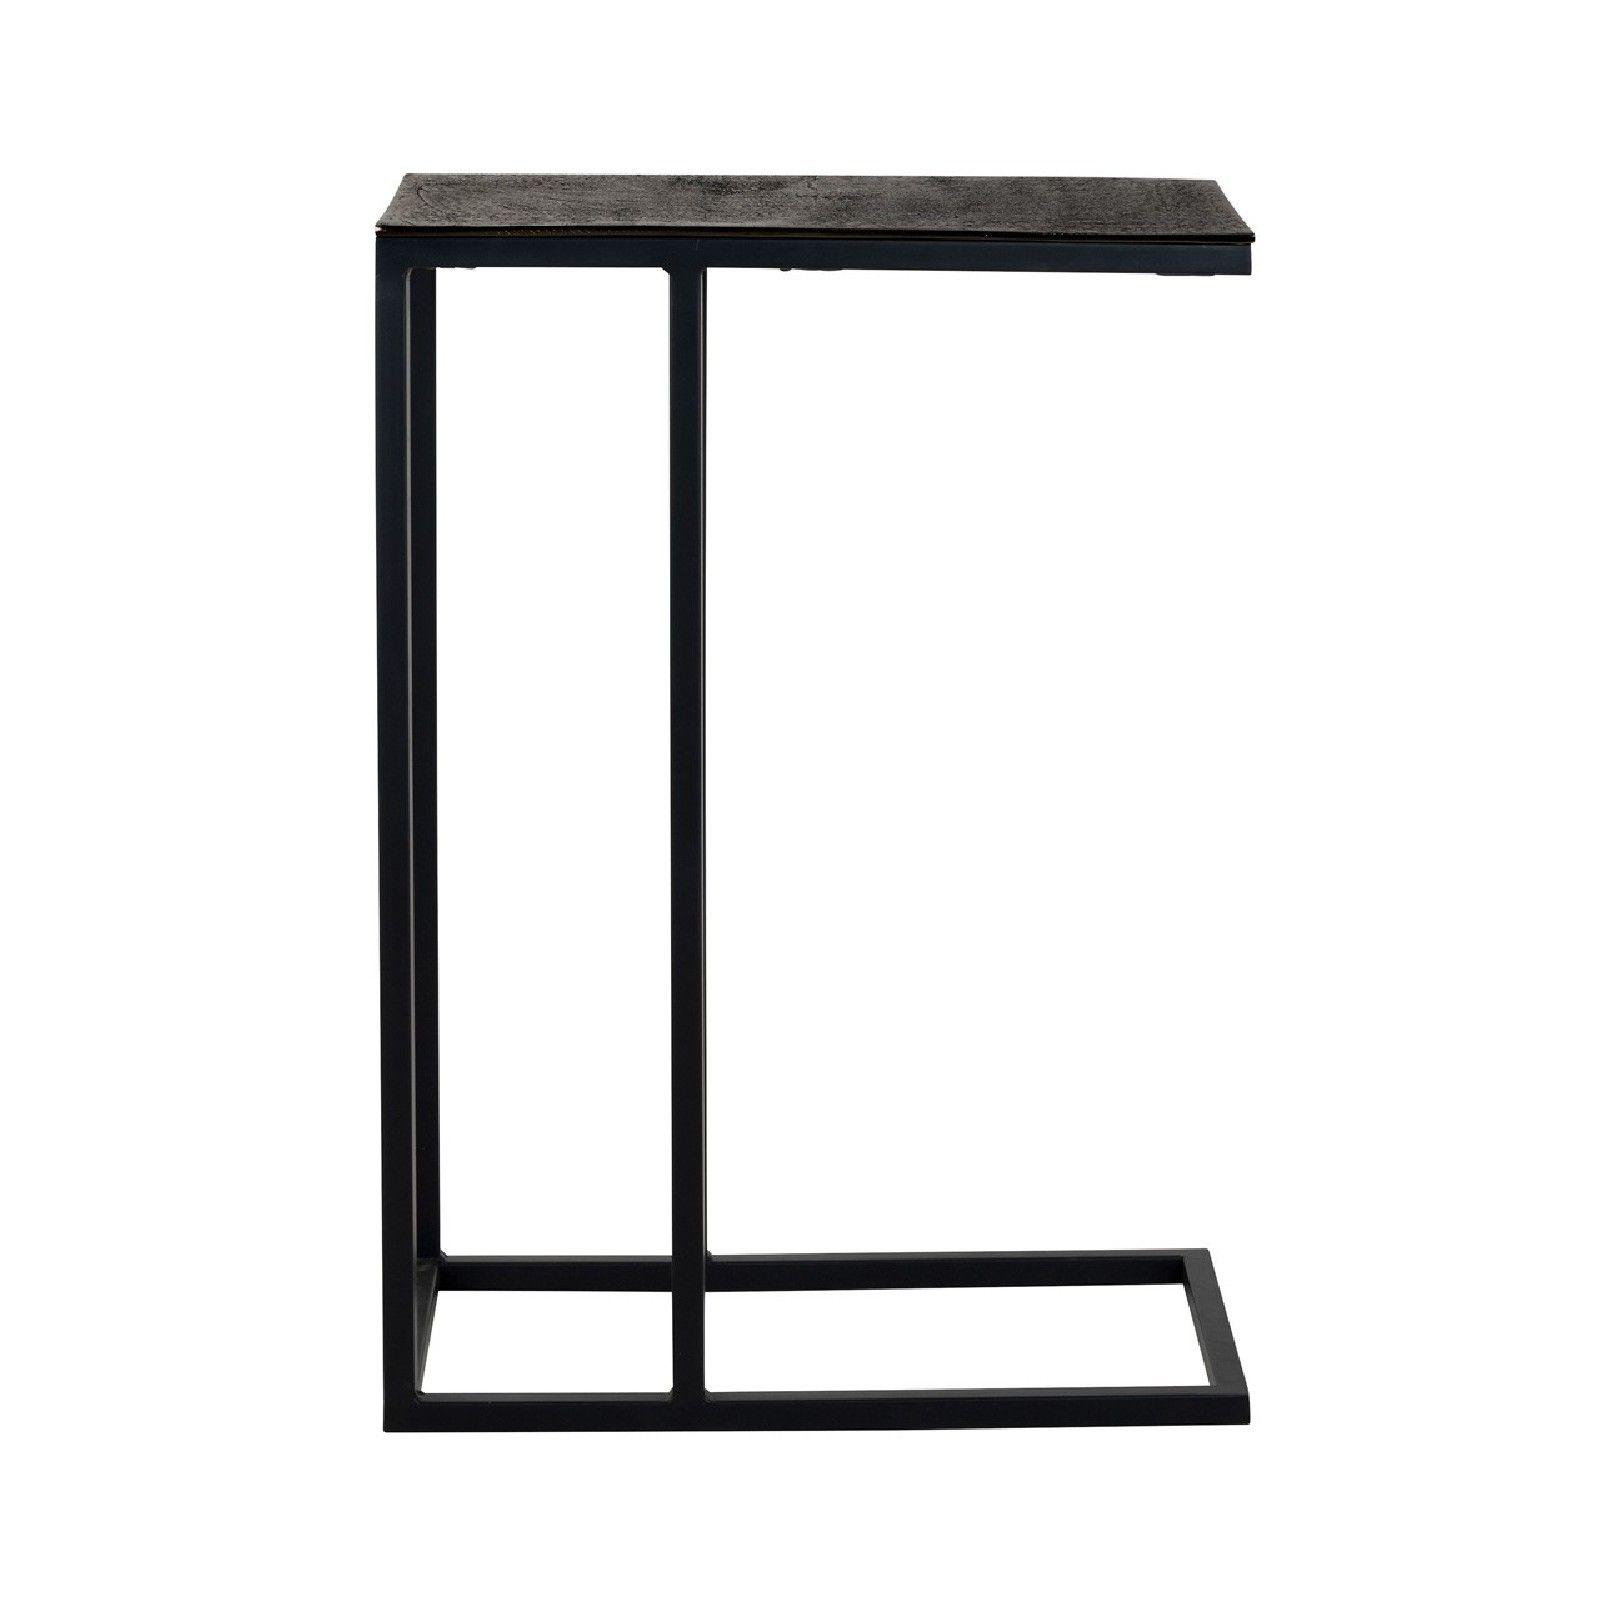 Table d'appoint Bolder aluminium noir Meuble Déco Tendance - 824